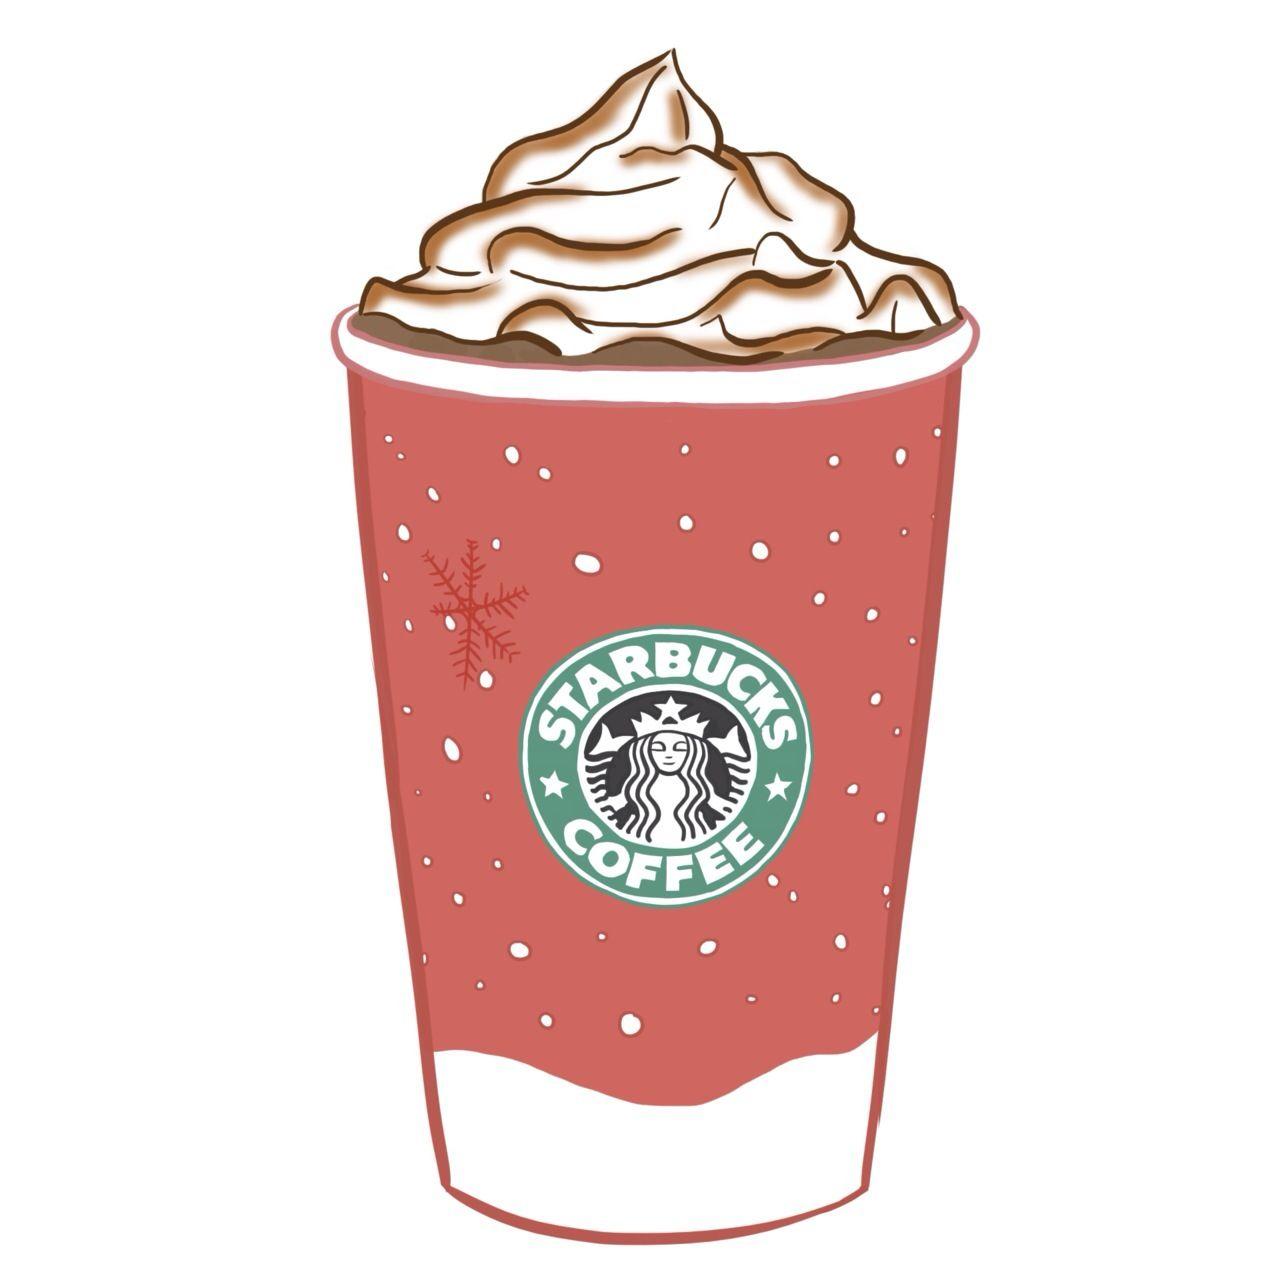 Starbucks Starbucks wallpaper, Starbucks drawing